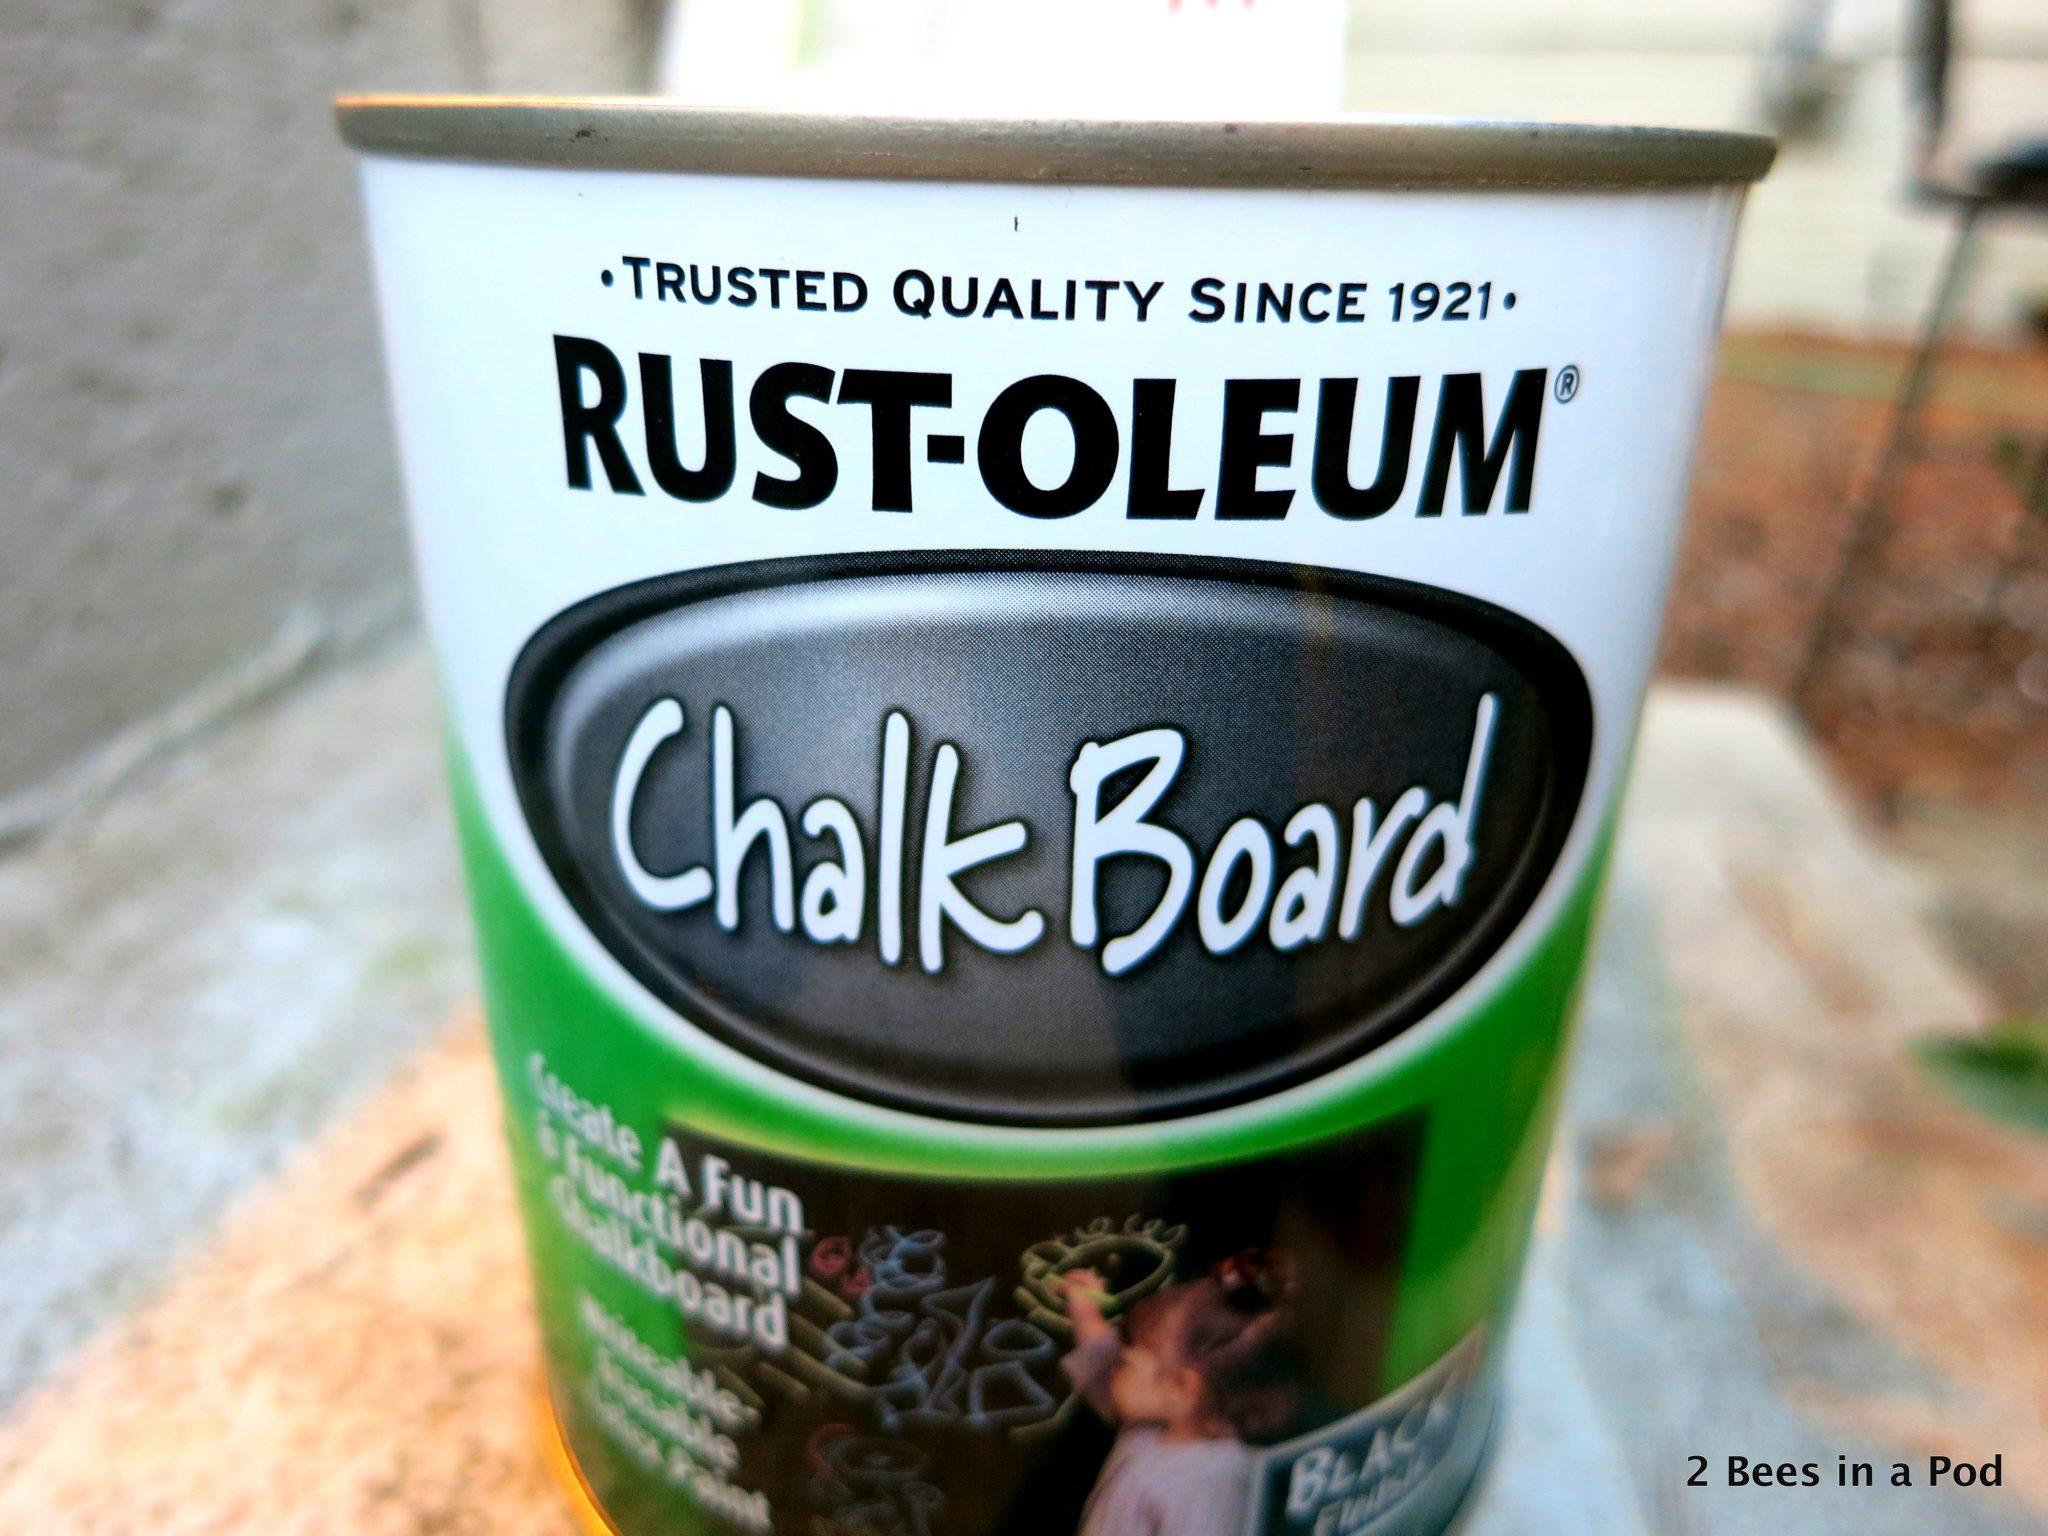 Rust-oleum chalk board paint